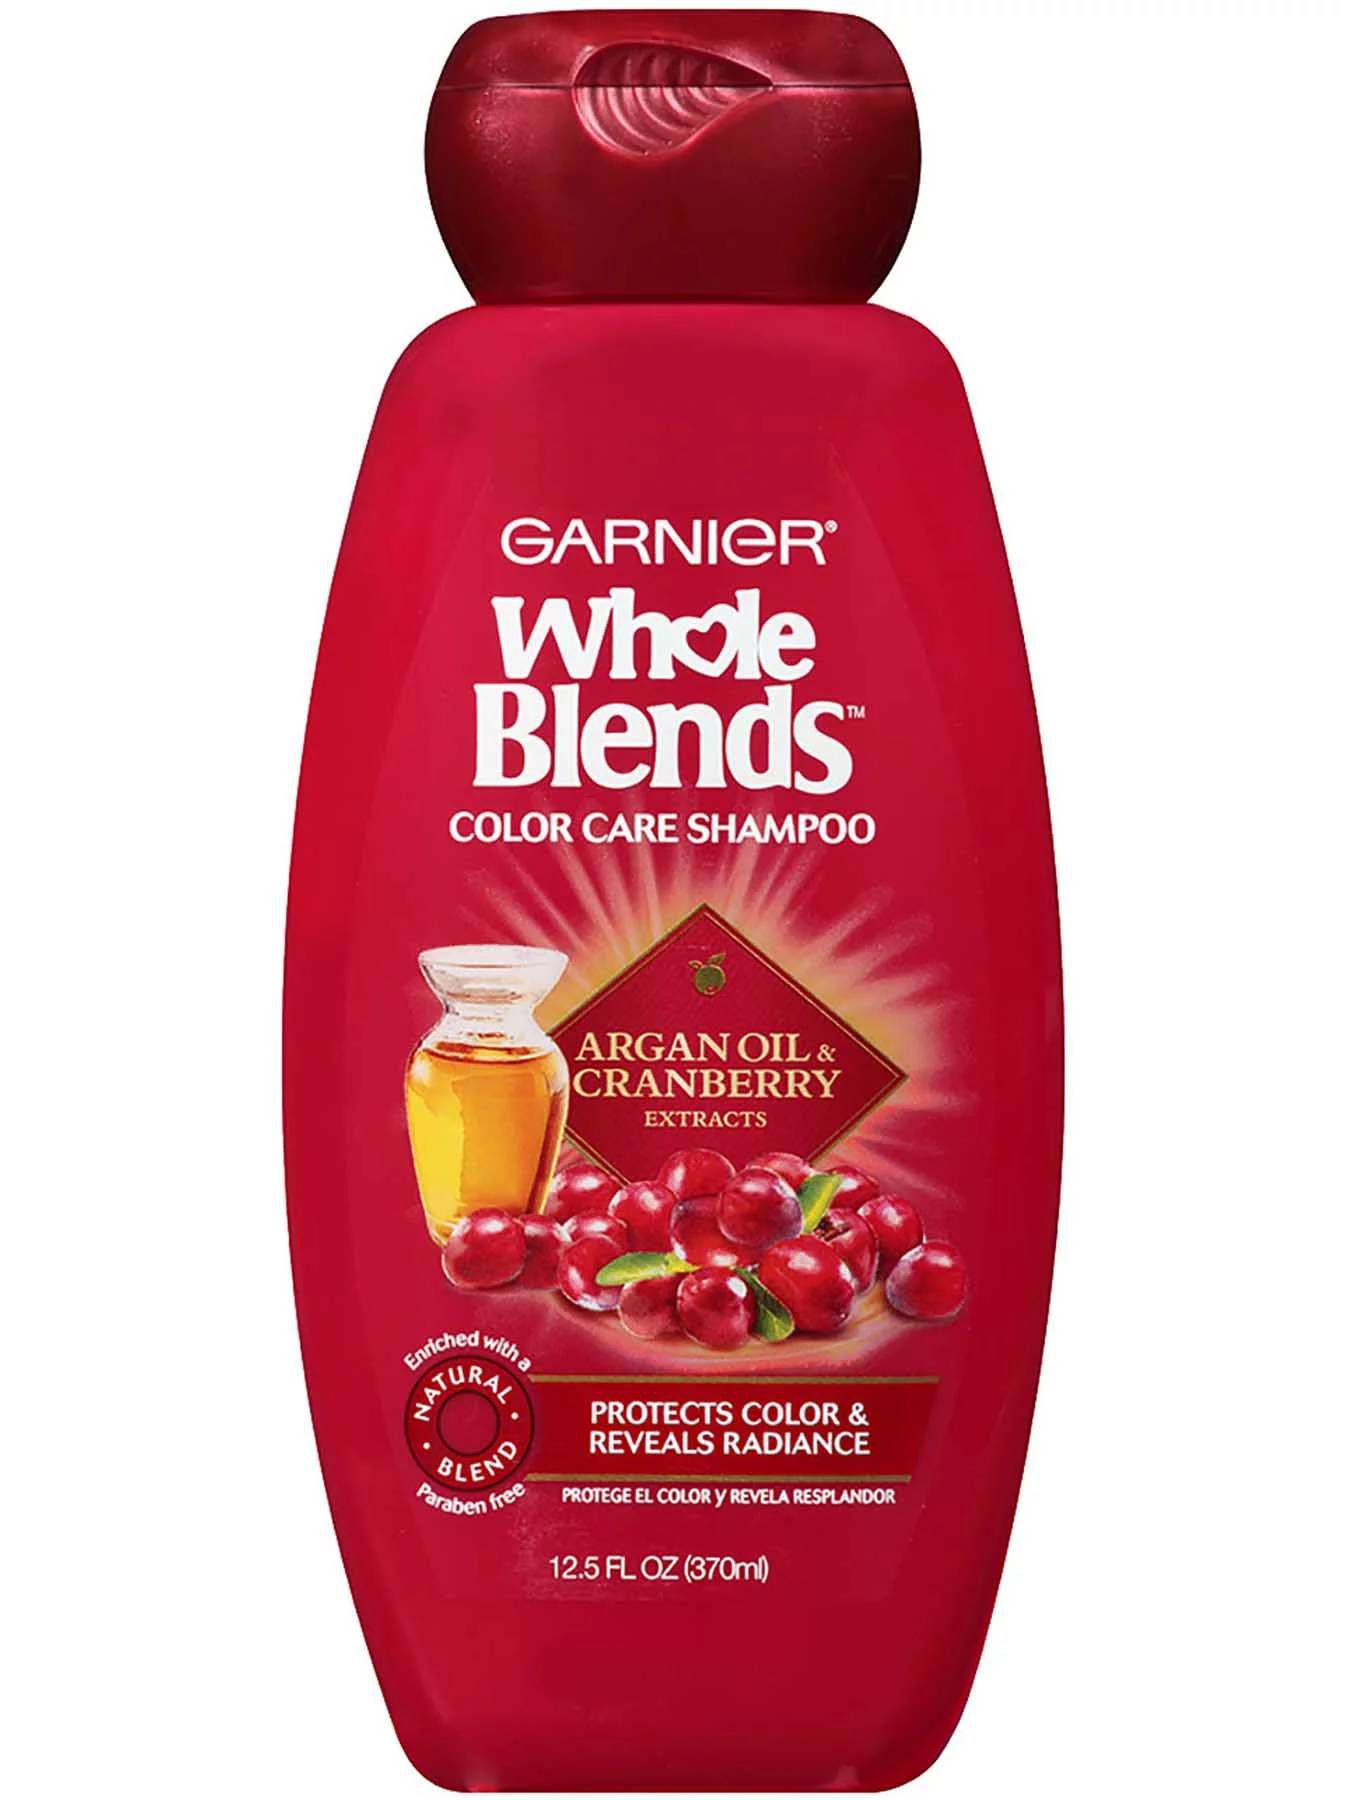 Garnier Whole Blends Color Care Shampoo